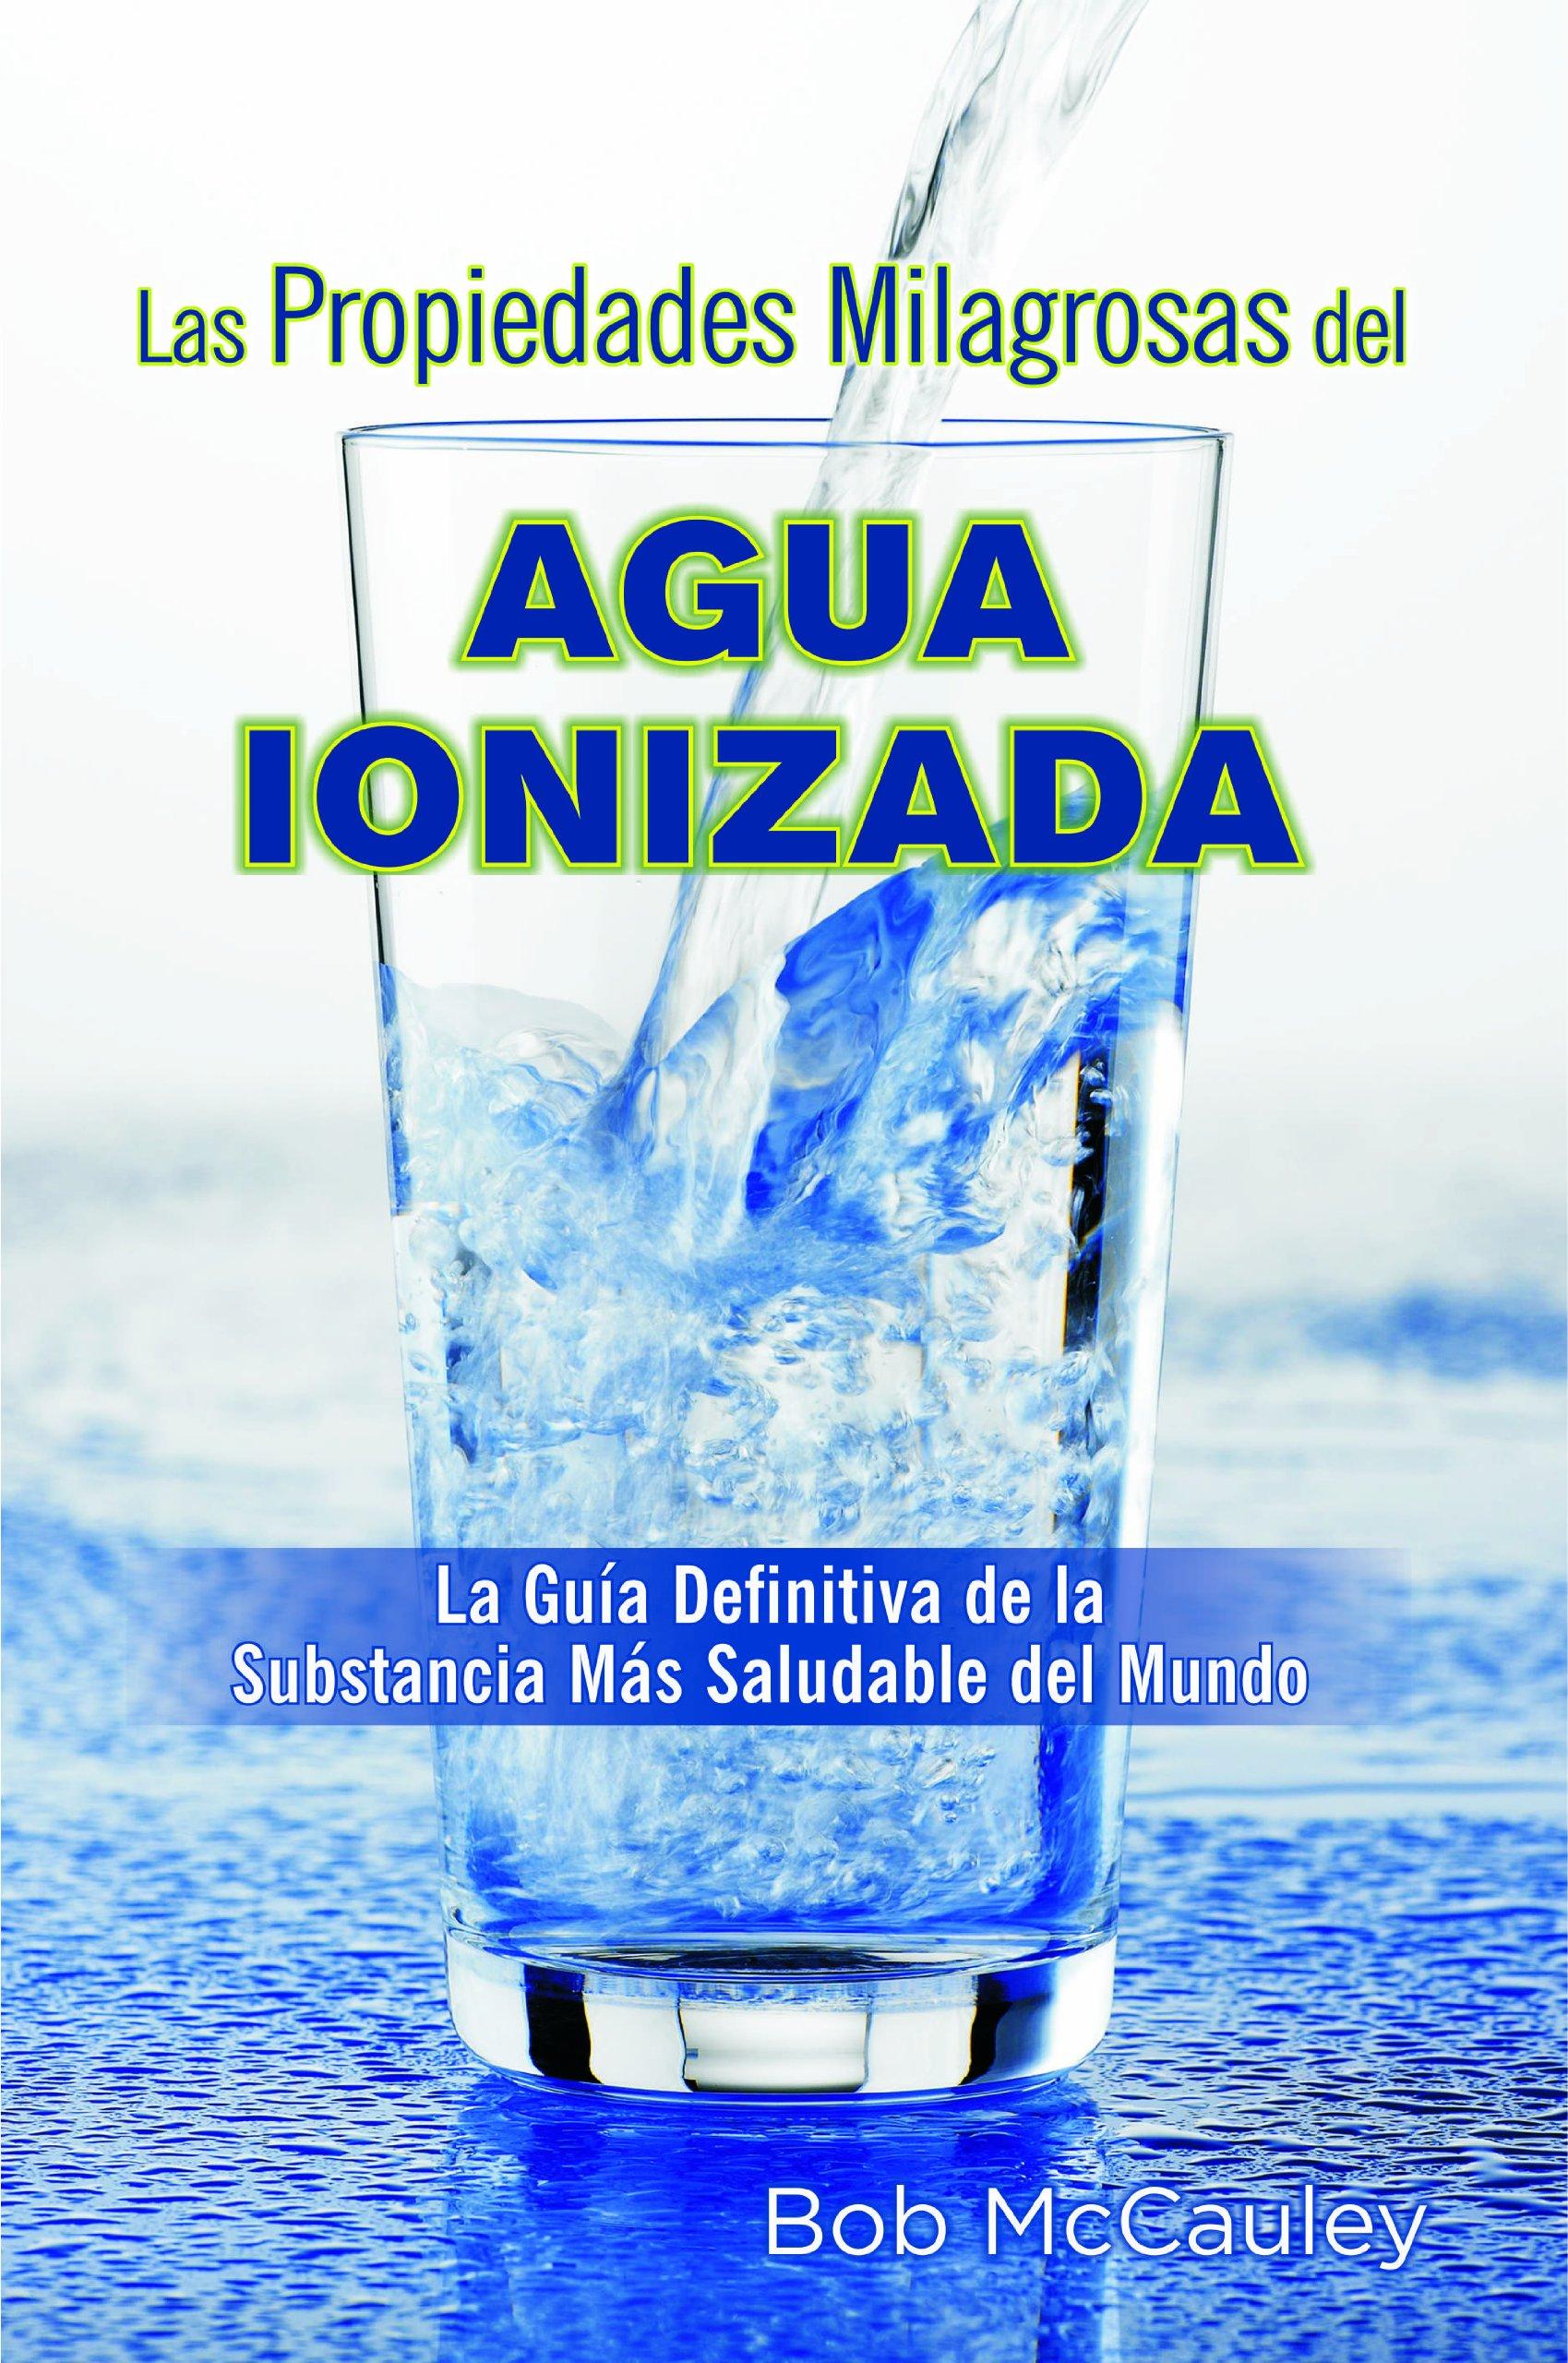 on sale performance sportswear another chance Las Propiedades Milagrosas del Agua Ionizada (Spanish ...